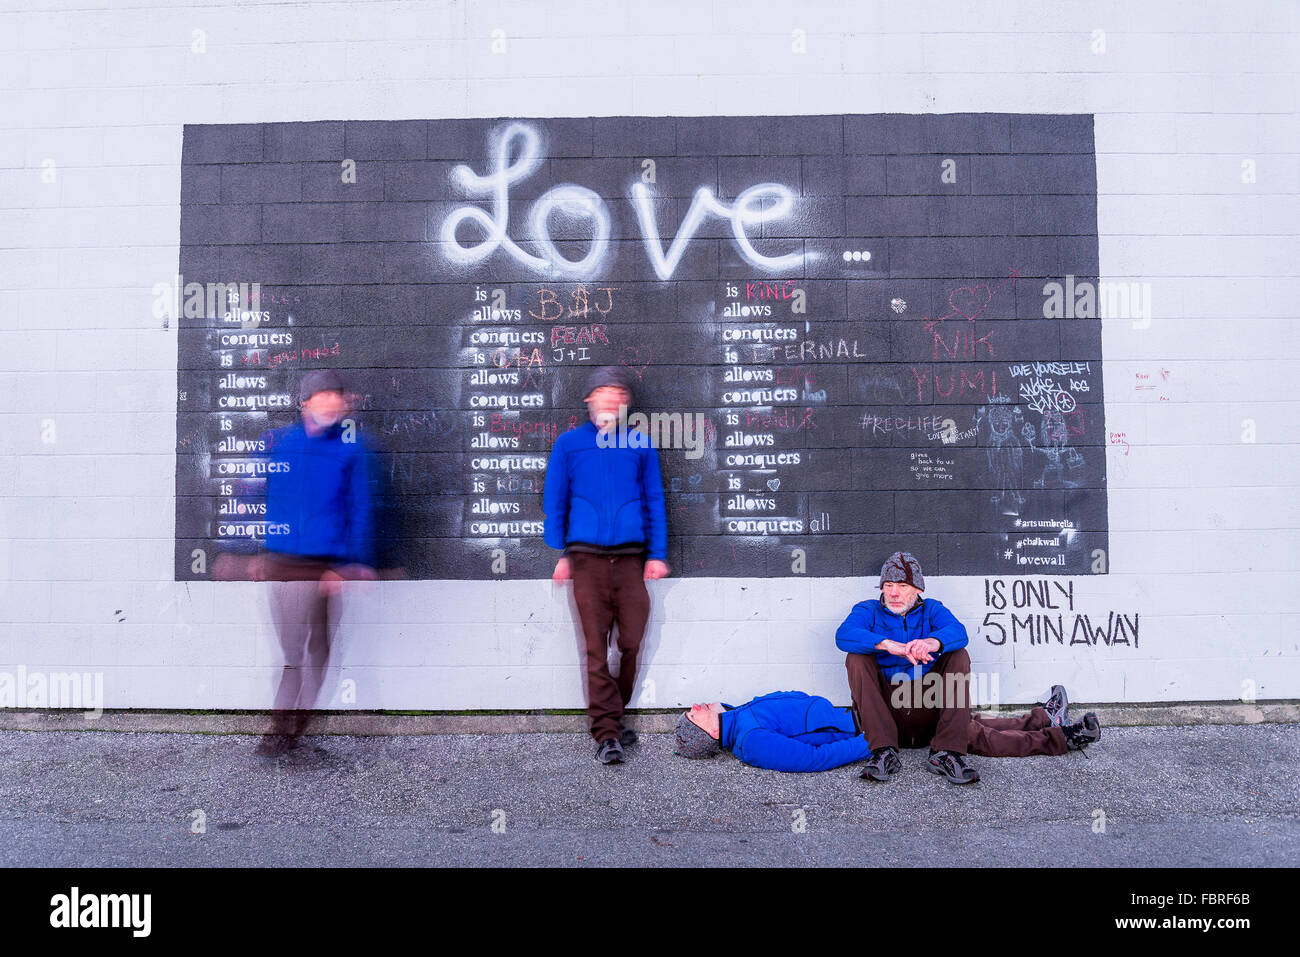 Die Liebe besiegt alles, interaktive Tafel, Granville Island, Vancouver, British Columbia Kanada Stockbild